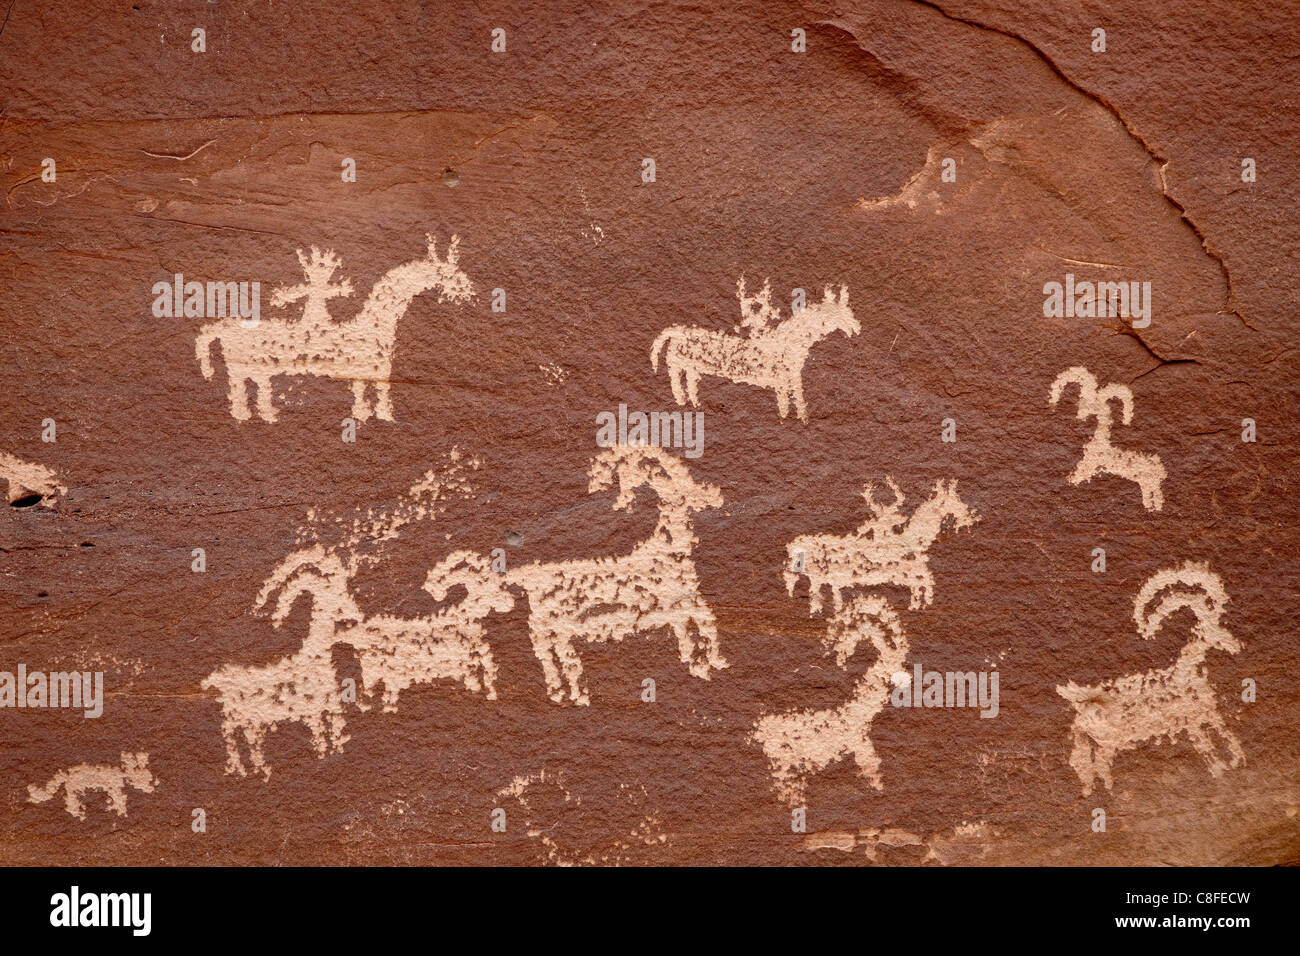 Bighorn hunt petroglyph panel, Arches National Park, Utah, United States of America - Stock Image